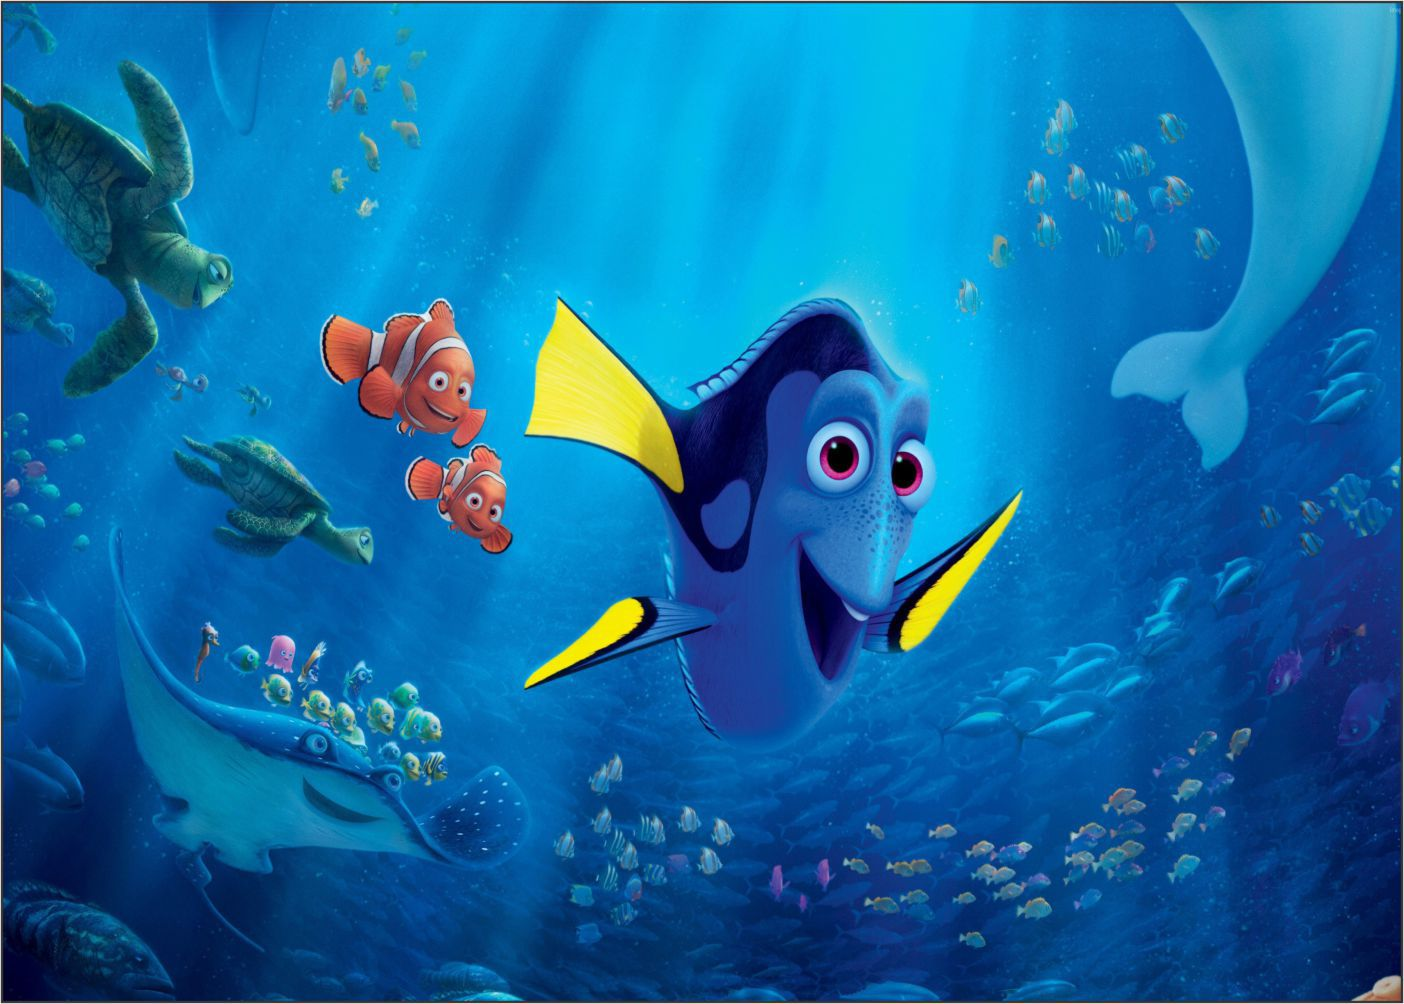 Papel de Parede 3D Nemo 0005 - Adesivos de Parede  - Paredes Decoradas